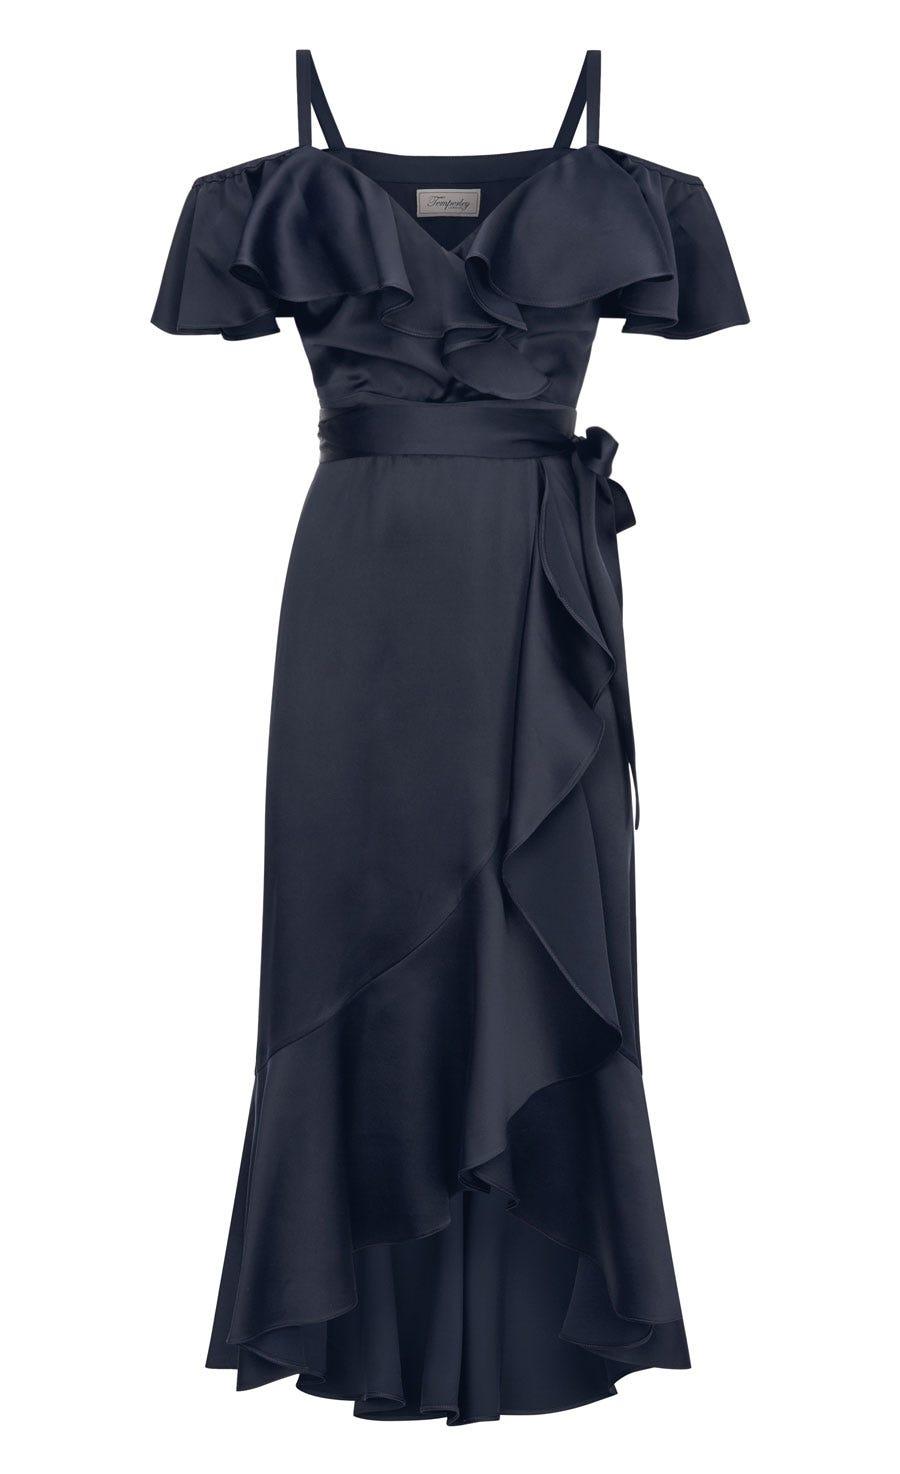 Carnation Dress